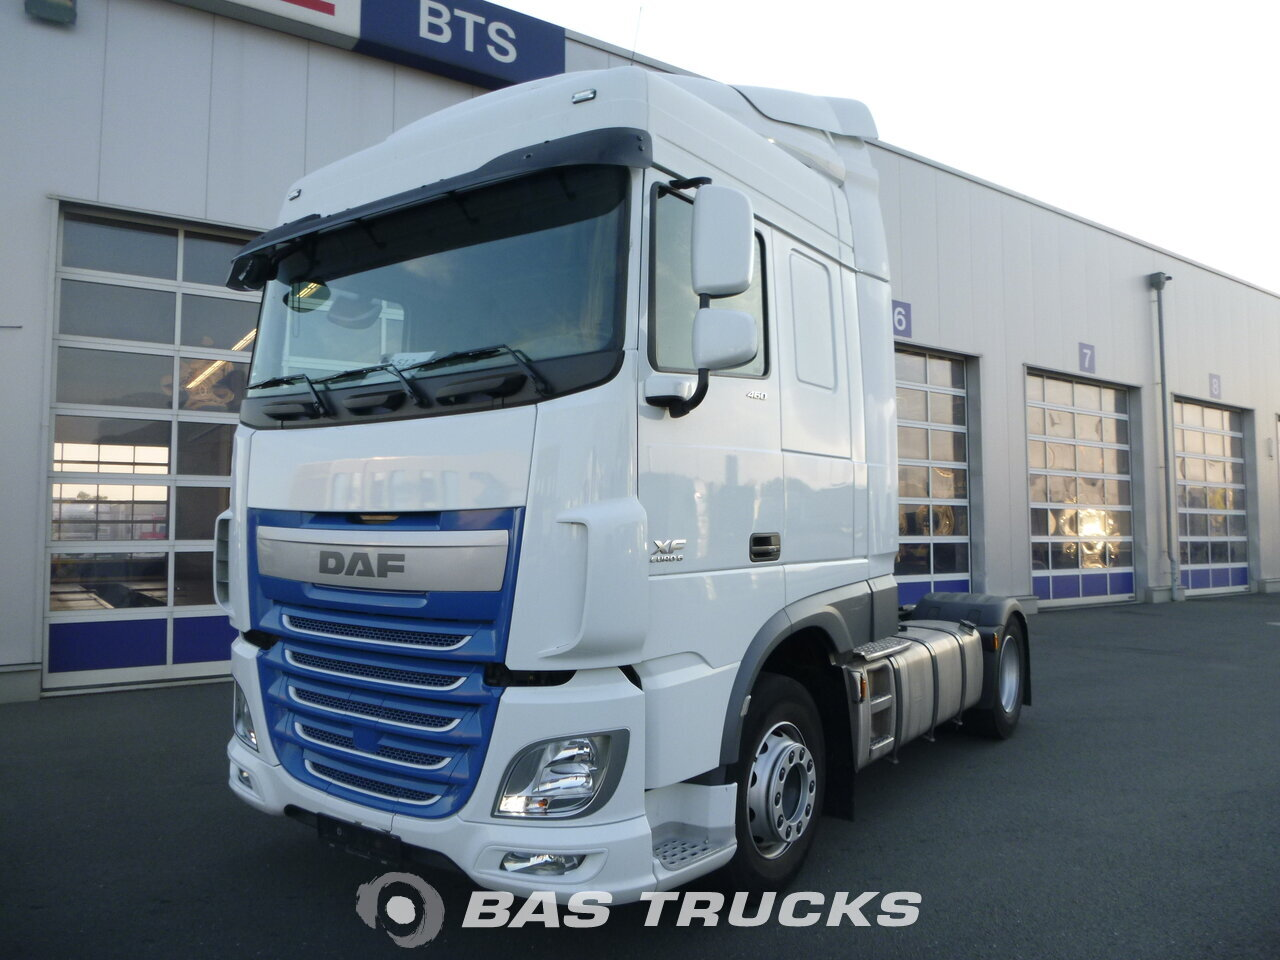 daf xf 460 sc dortmund de tracteur euro 6 49900 bas trucks. Black Bedroom Furniture Sets. Home Design Ideas